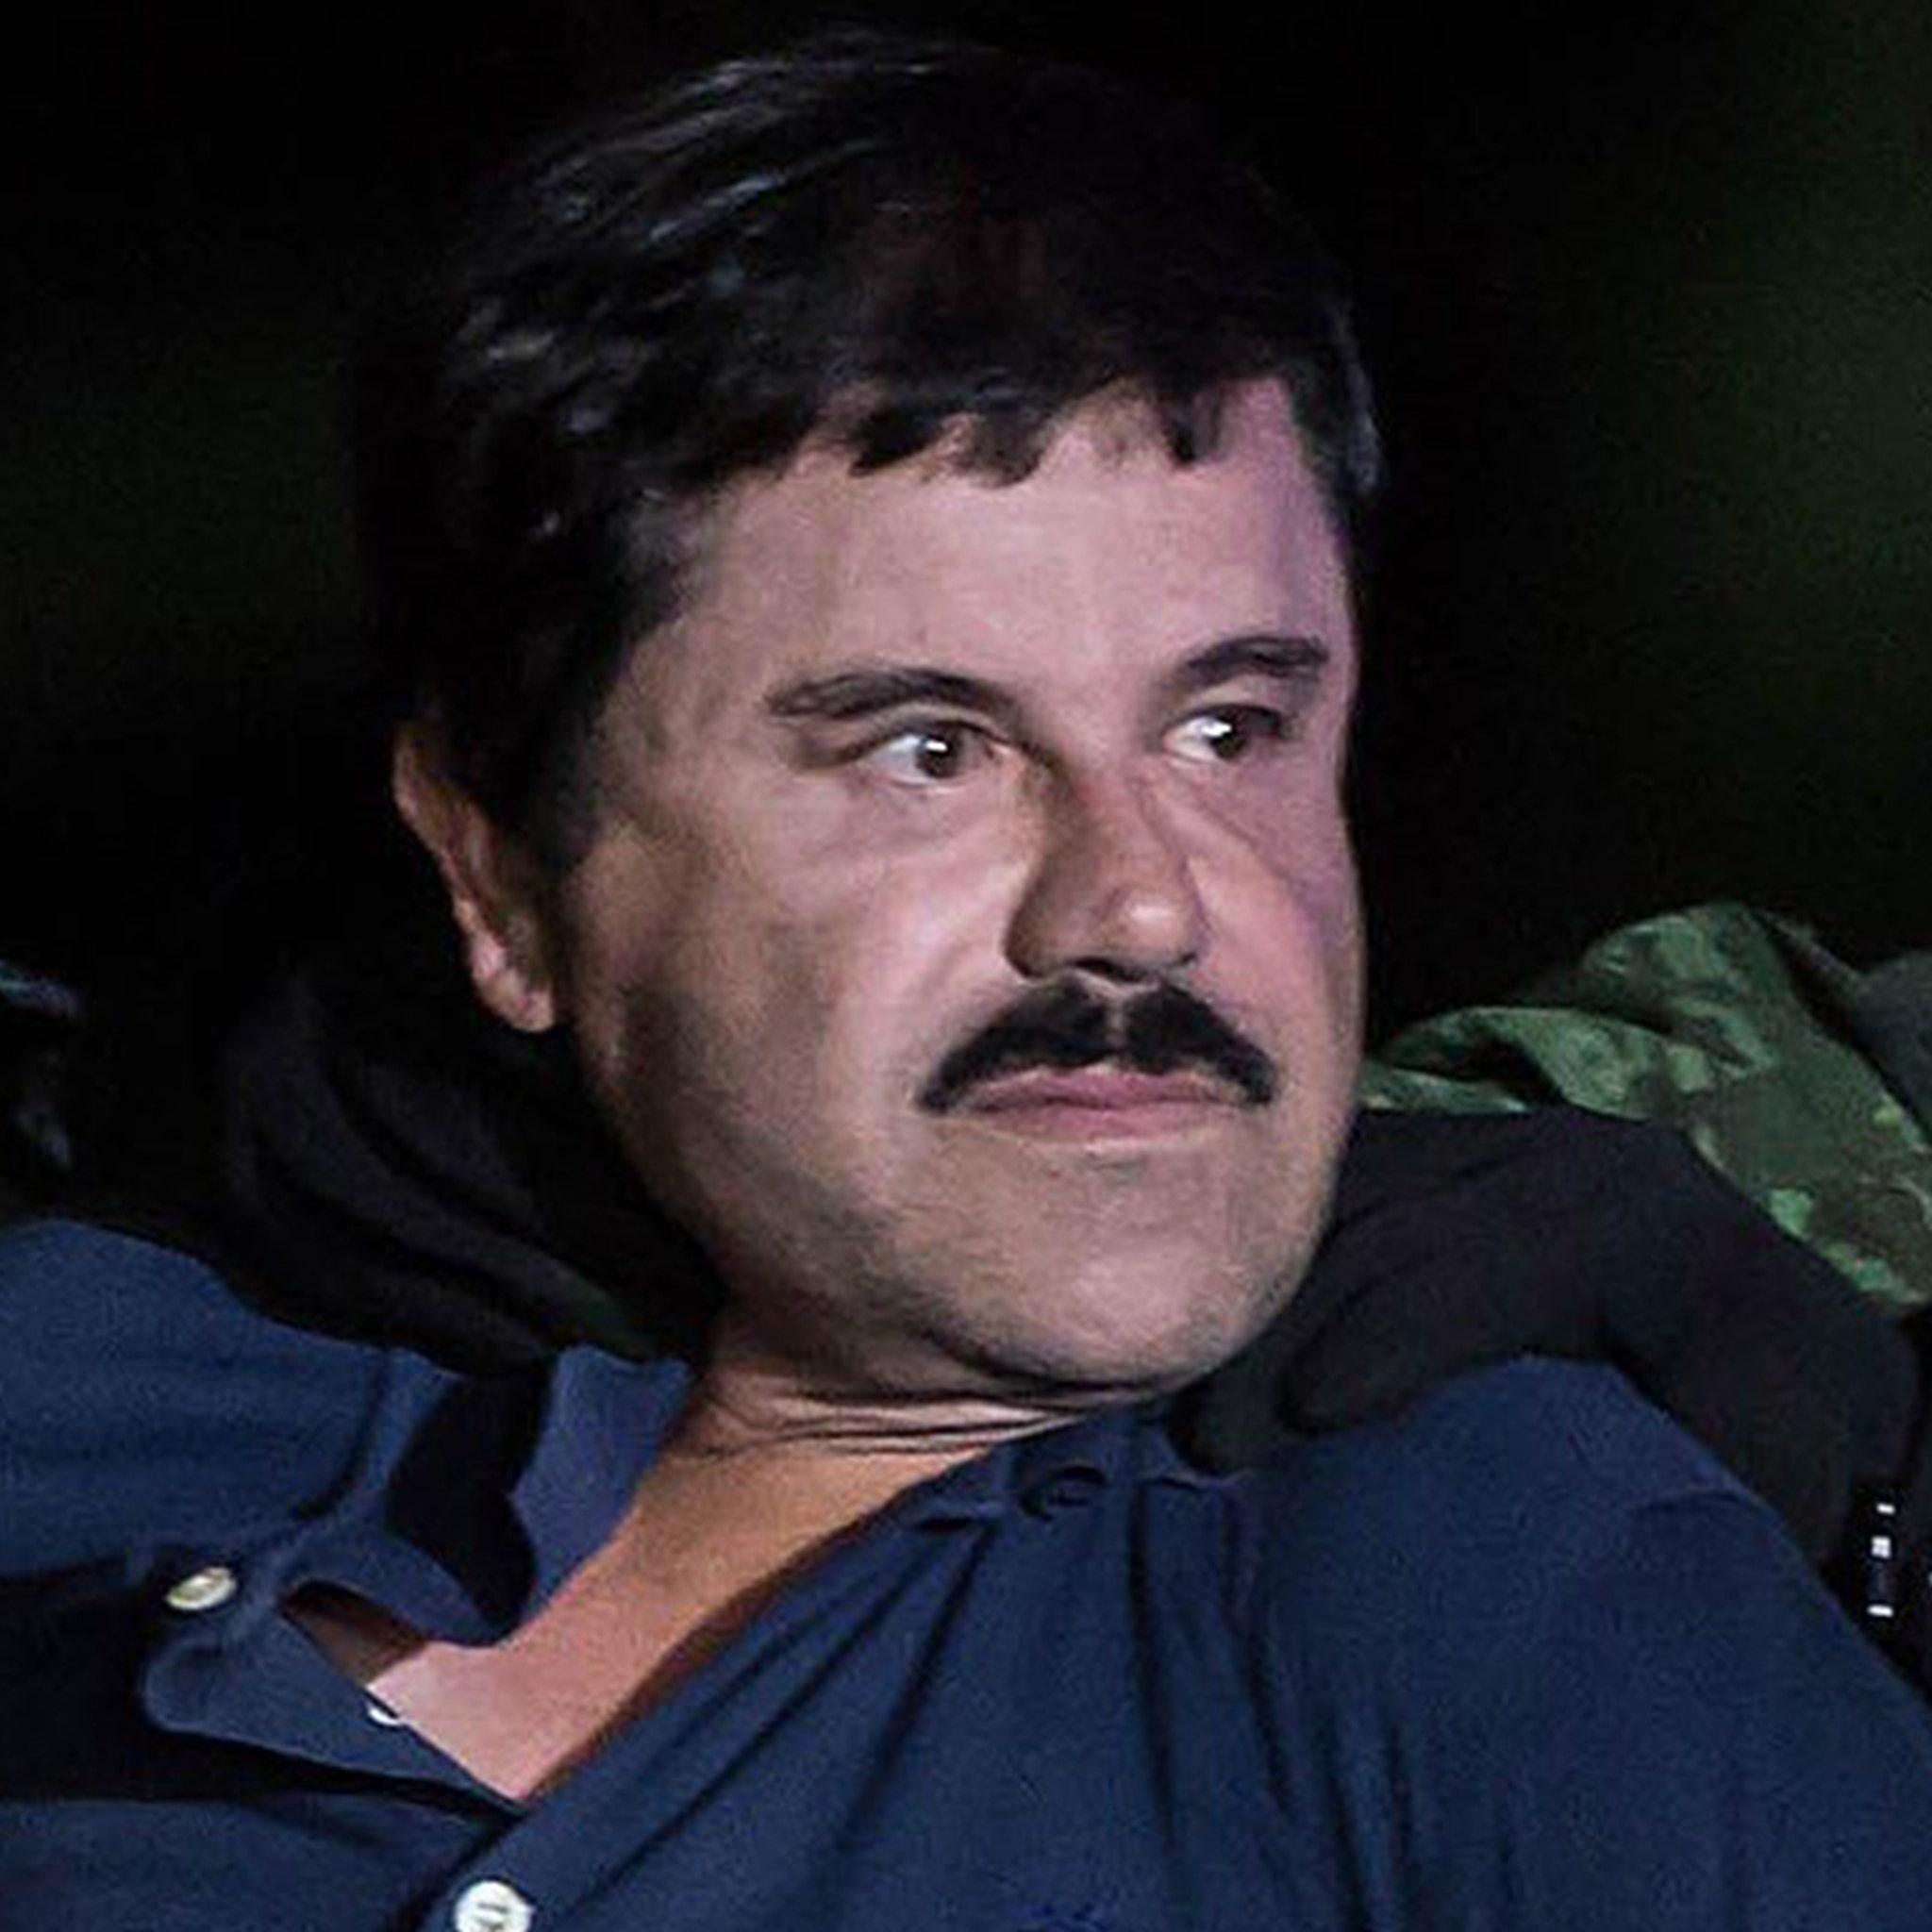 El Chapo's Son Taken Into Custody in Mexico